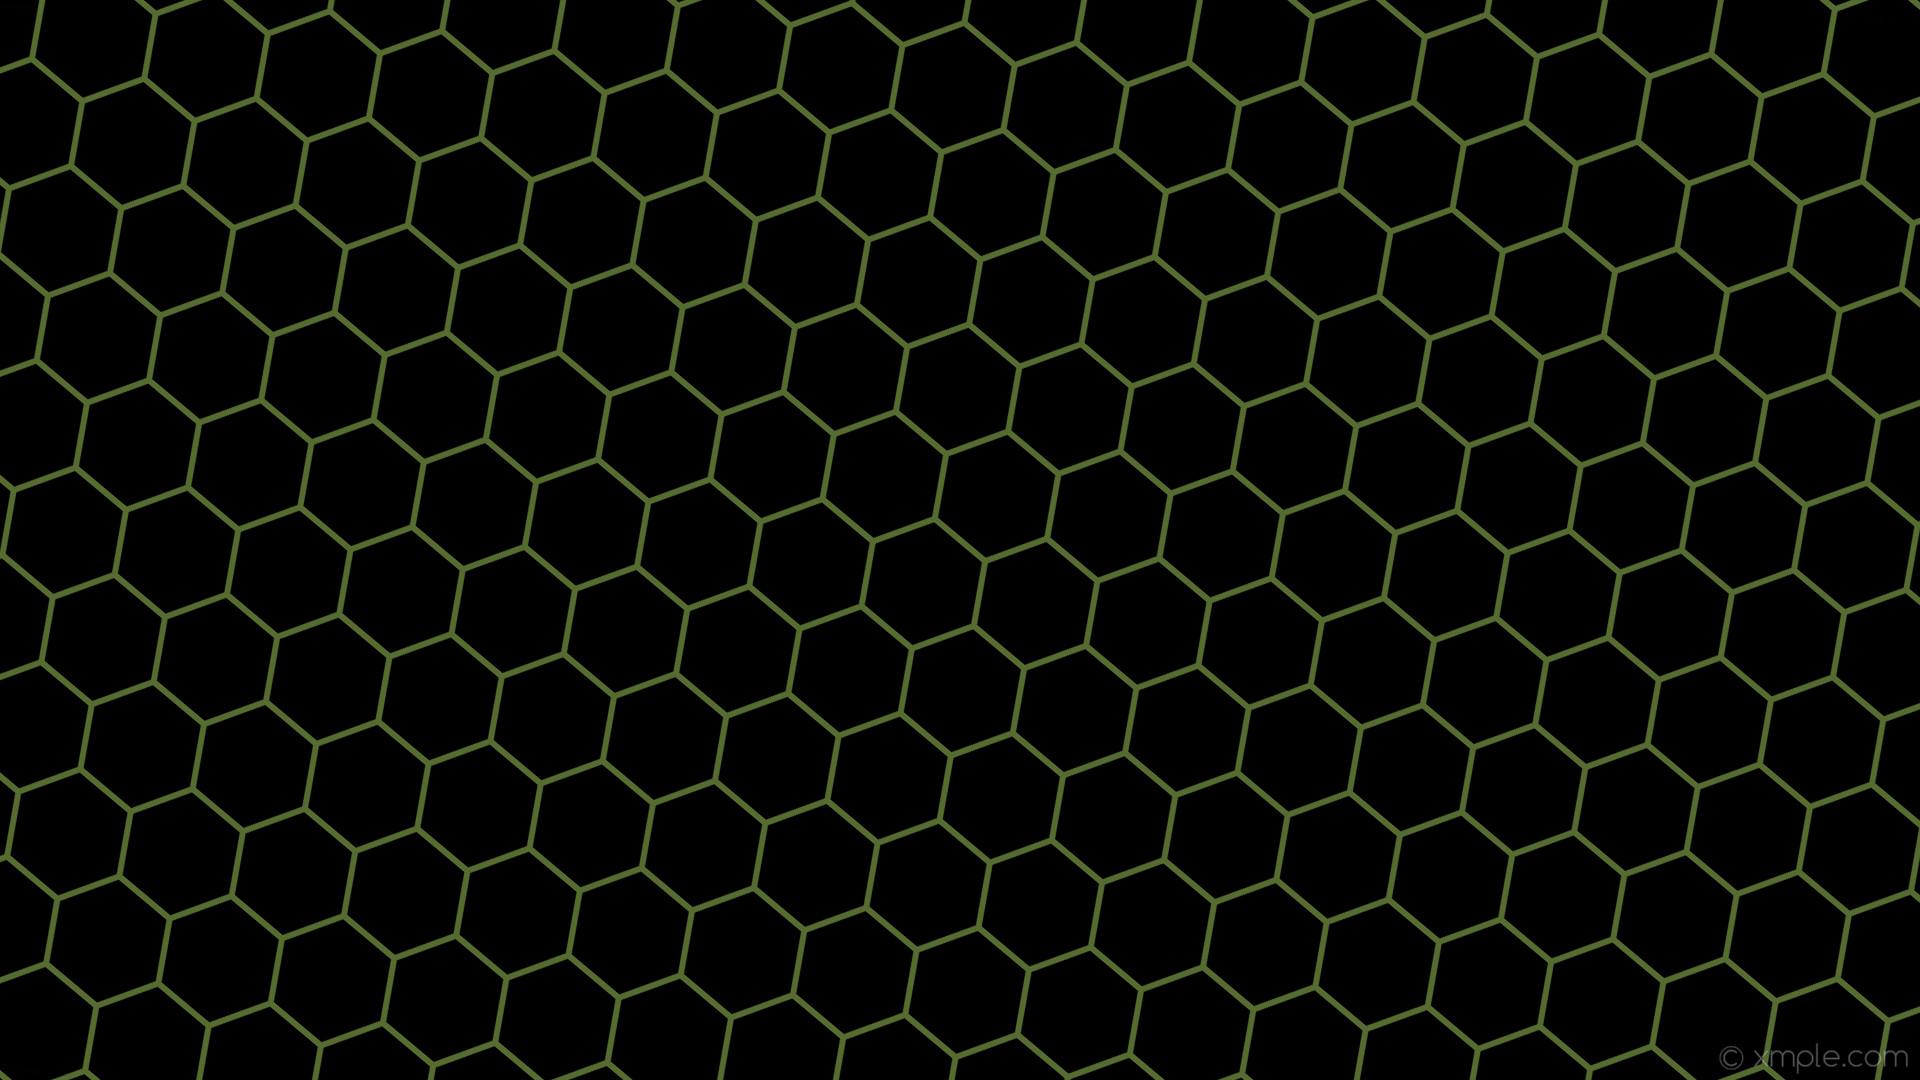 wallpaper green black honeycomb hexagon beehive dark olive green #000000  #556b2f diagonal 50°